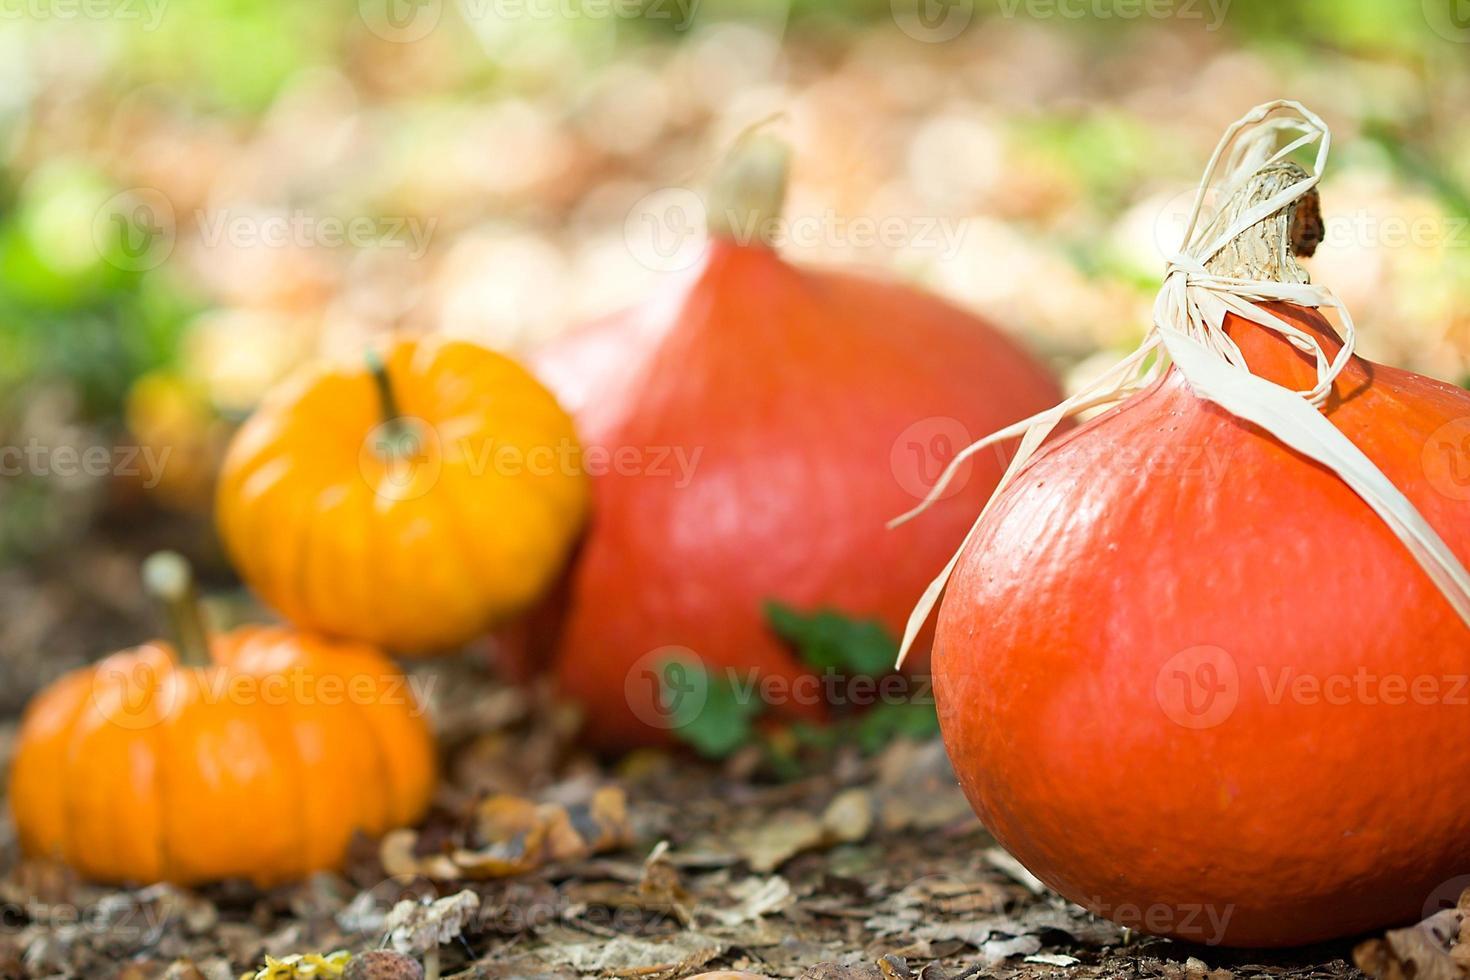 herfst groente close-up foto